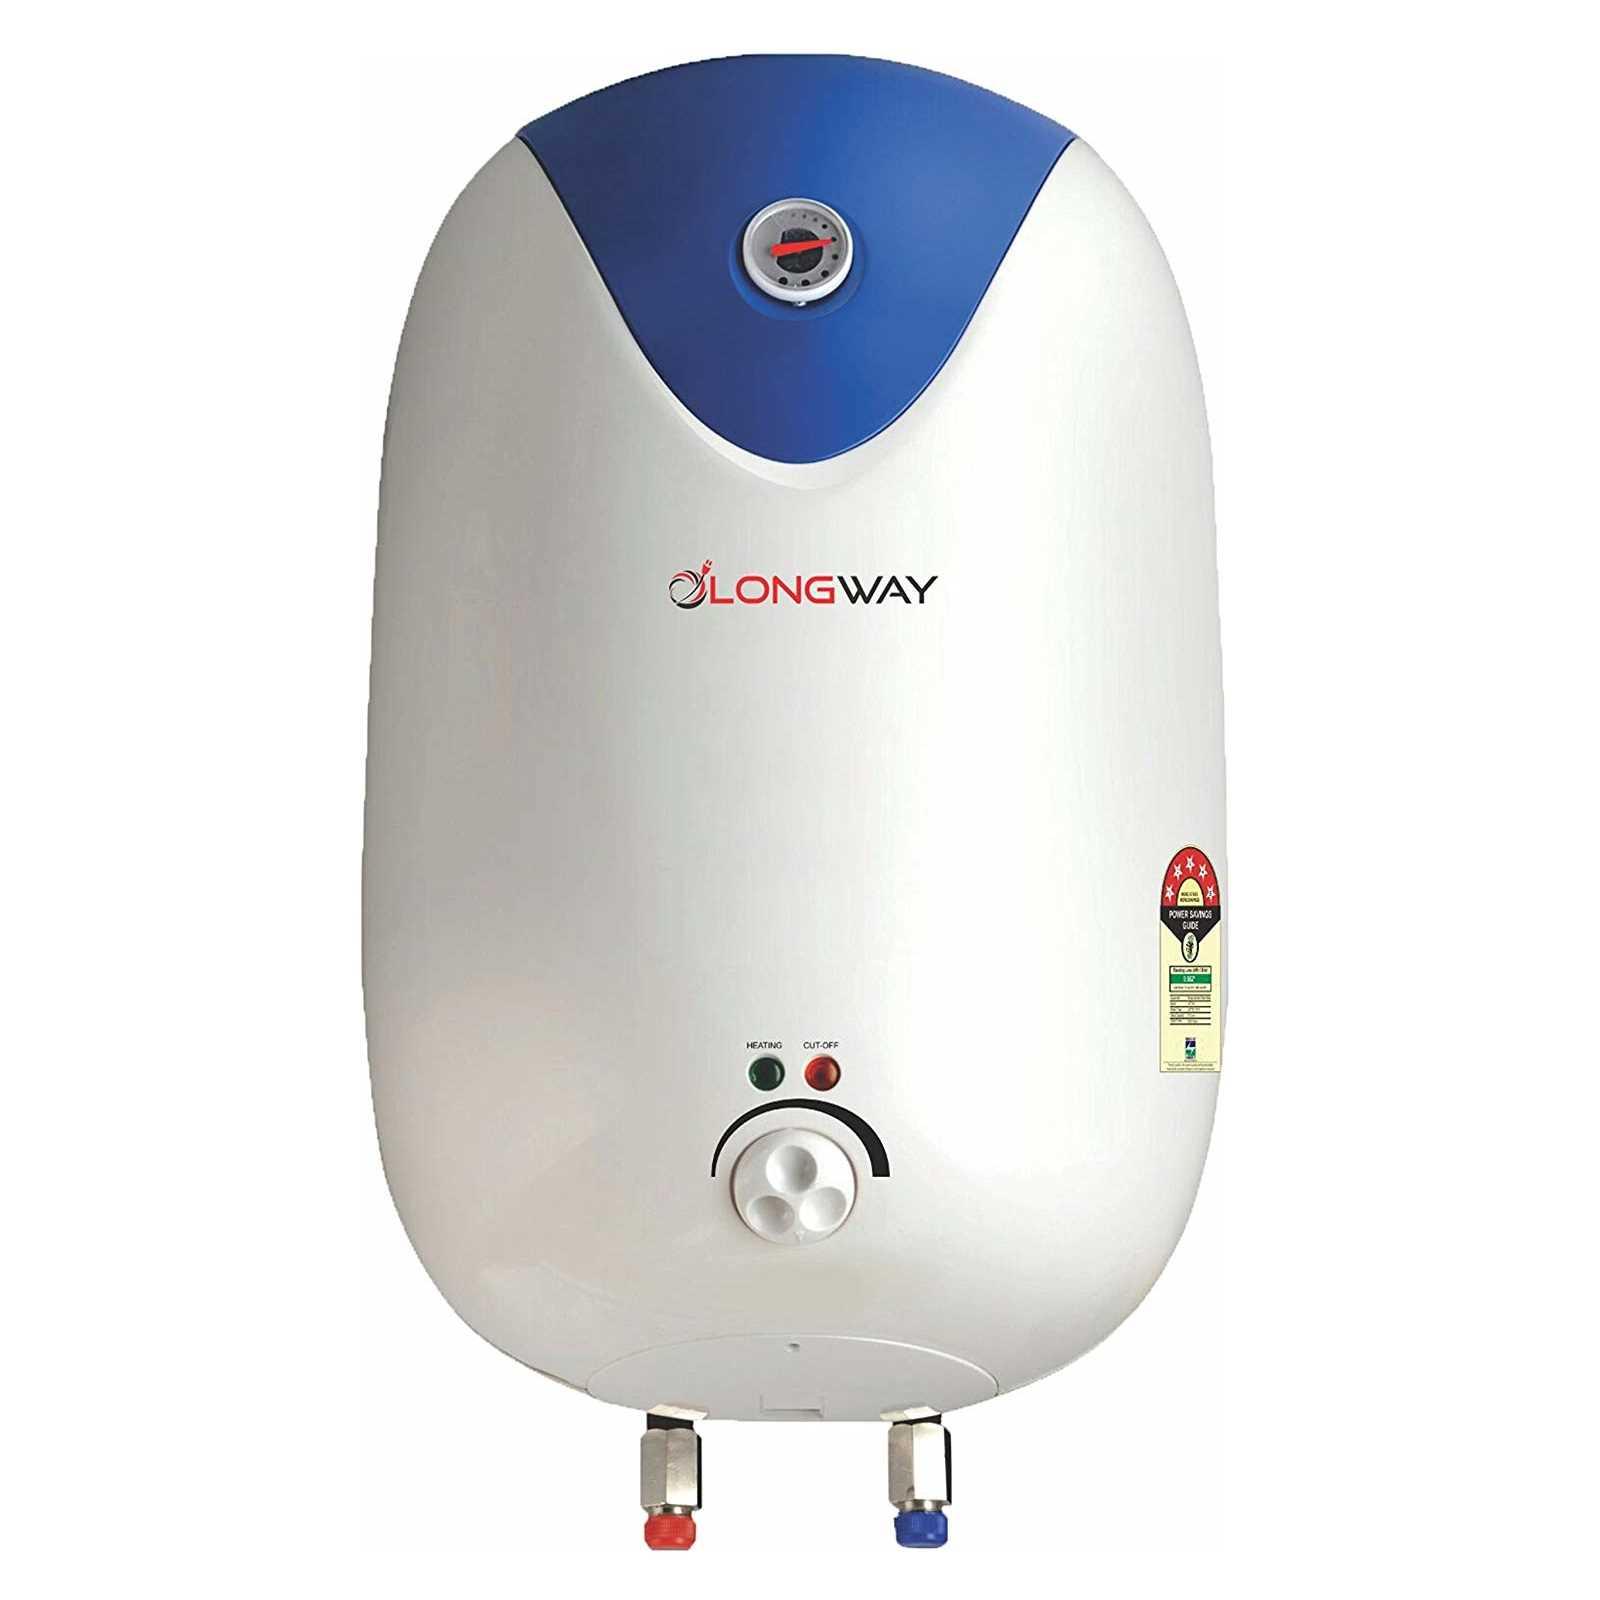 Longway Hotspring 25 Litre Storage Water Heater